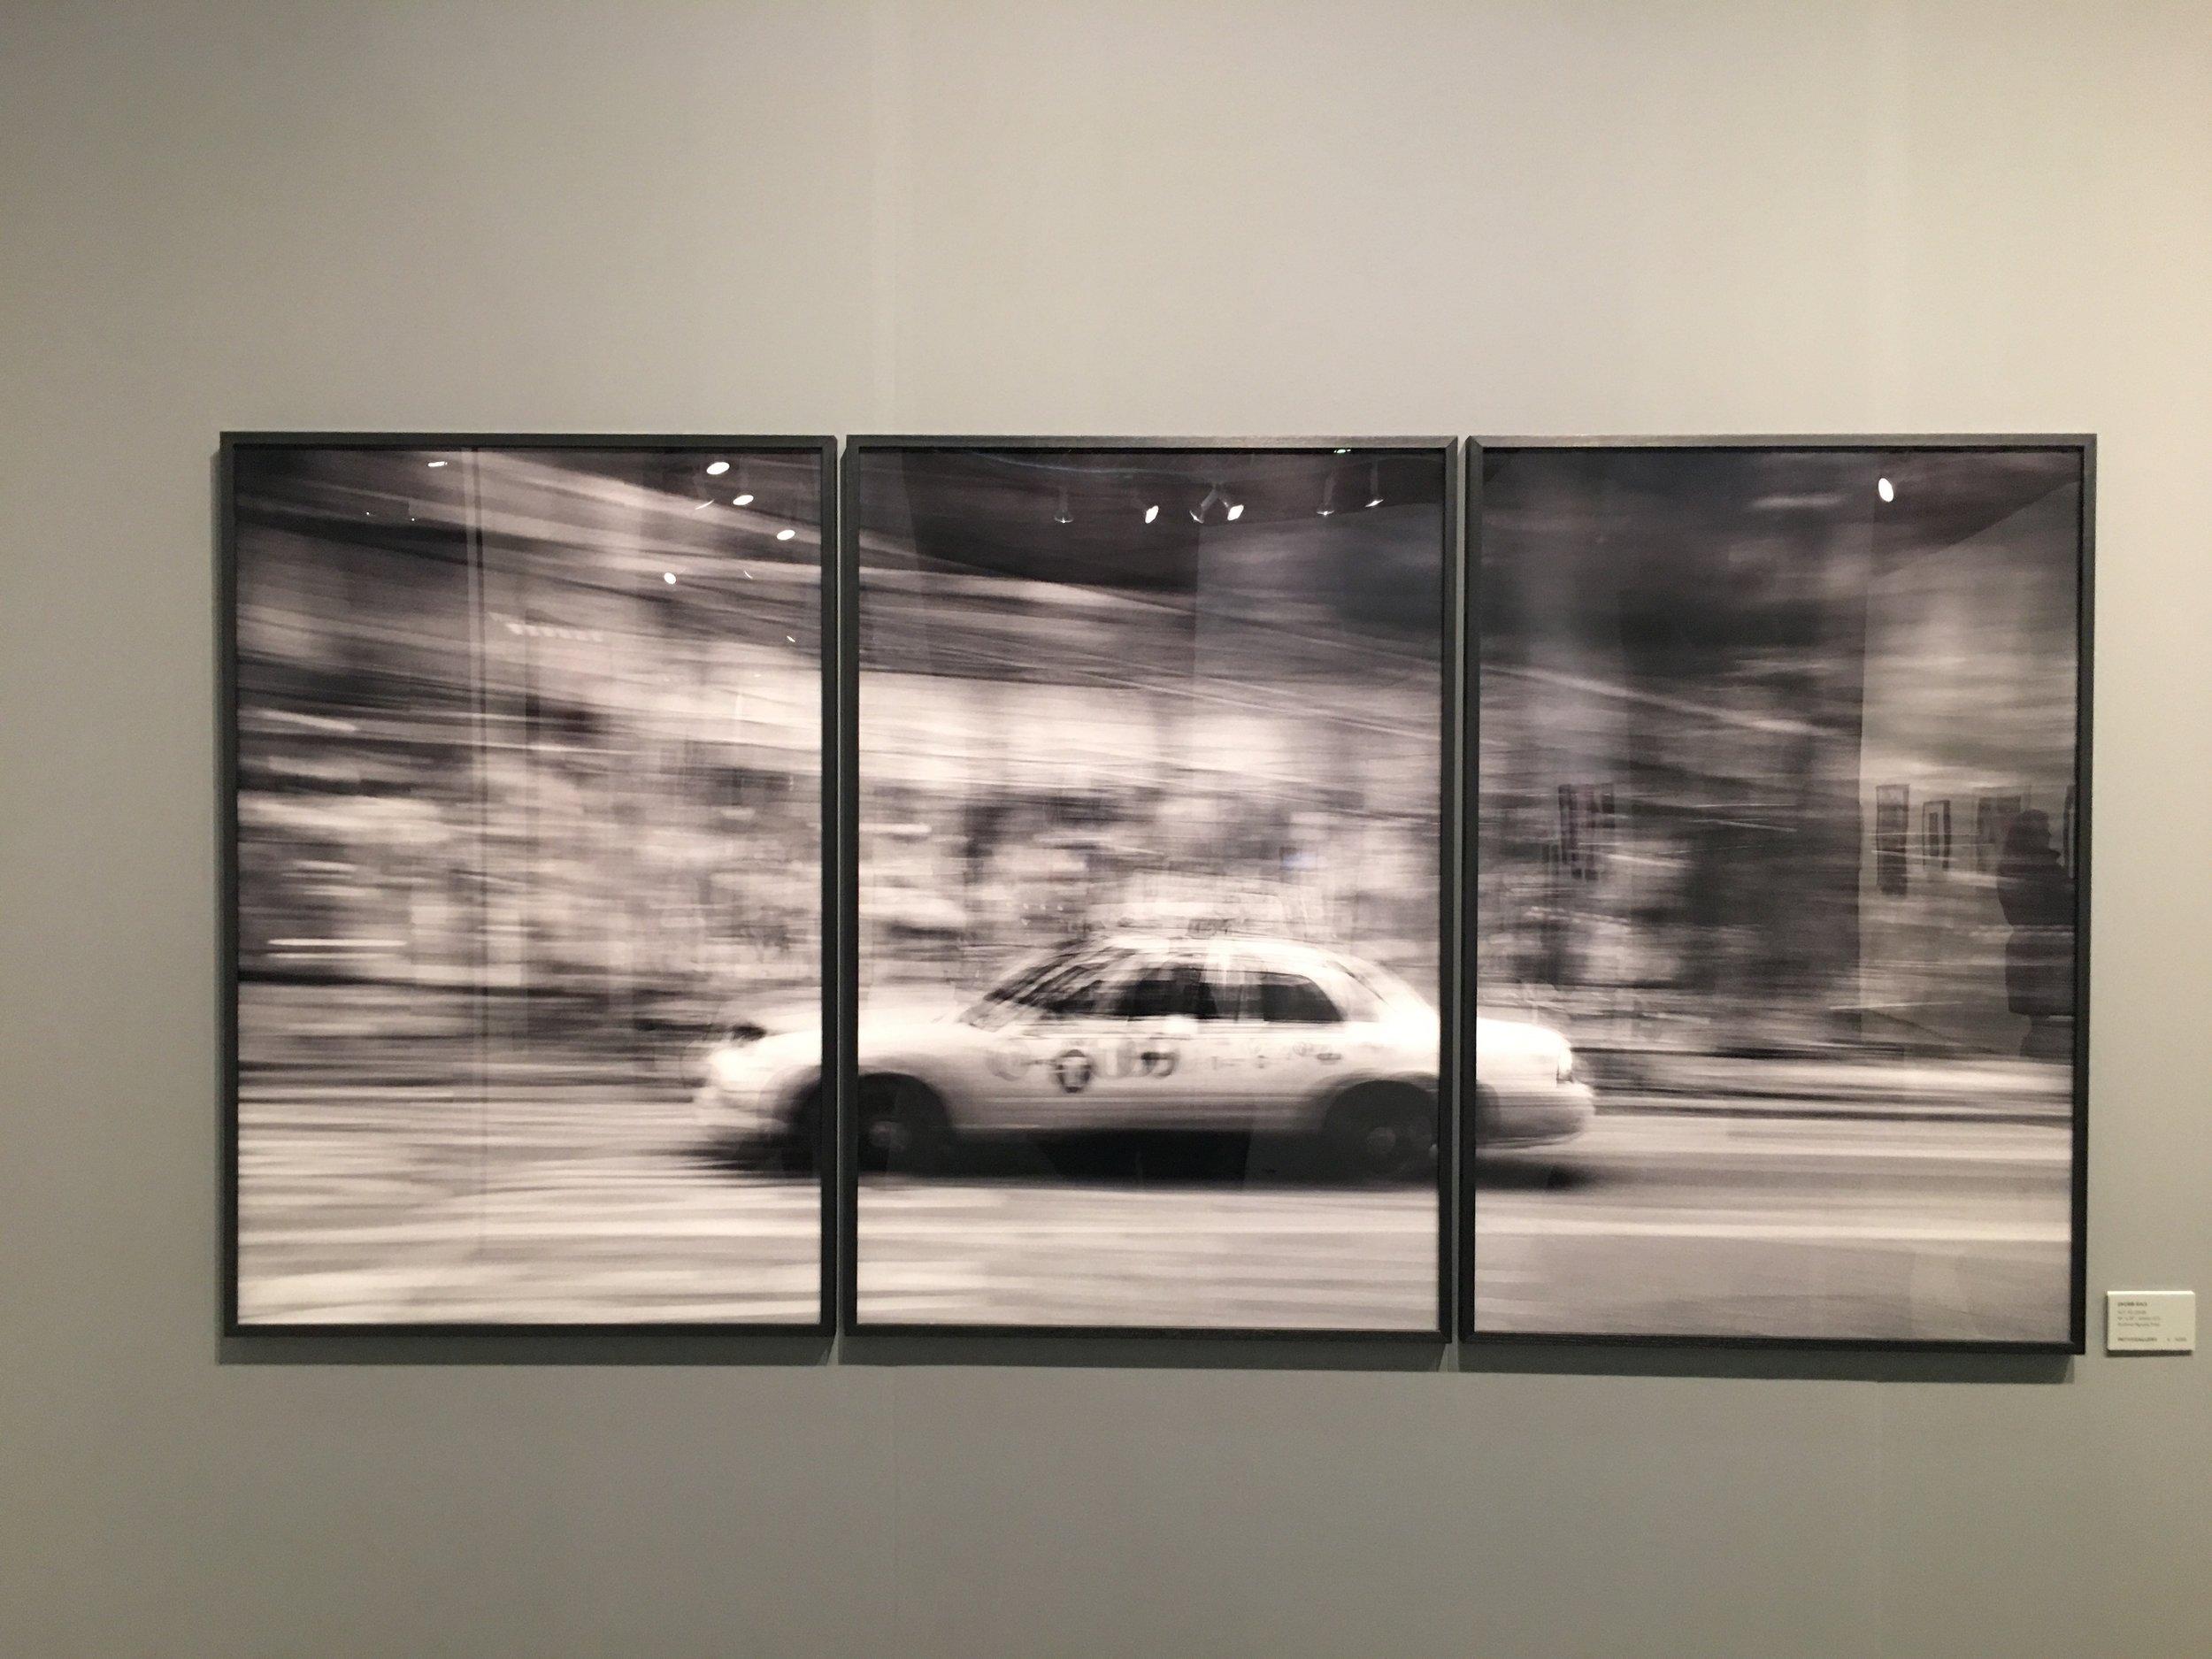 Photographer Jacob Gils, Movement Project, Leica Gallery, LA  PhotoLA, Sunday, February 3, Barker Hangar Photo by Christine La Monte